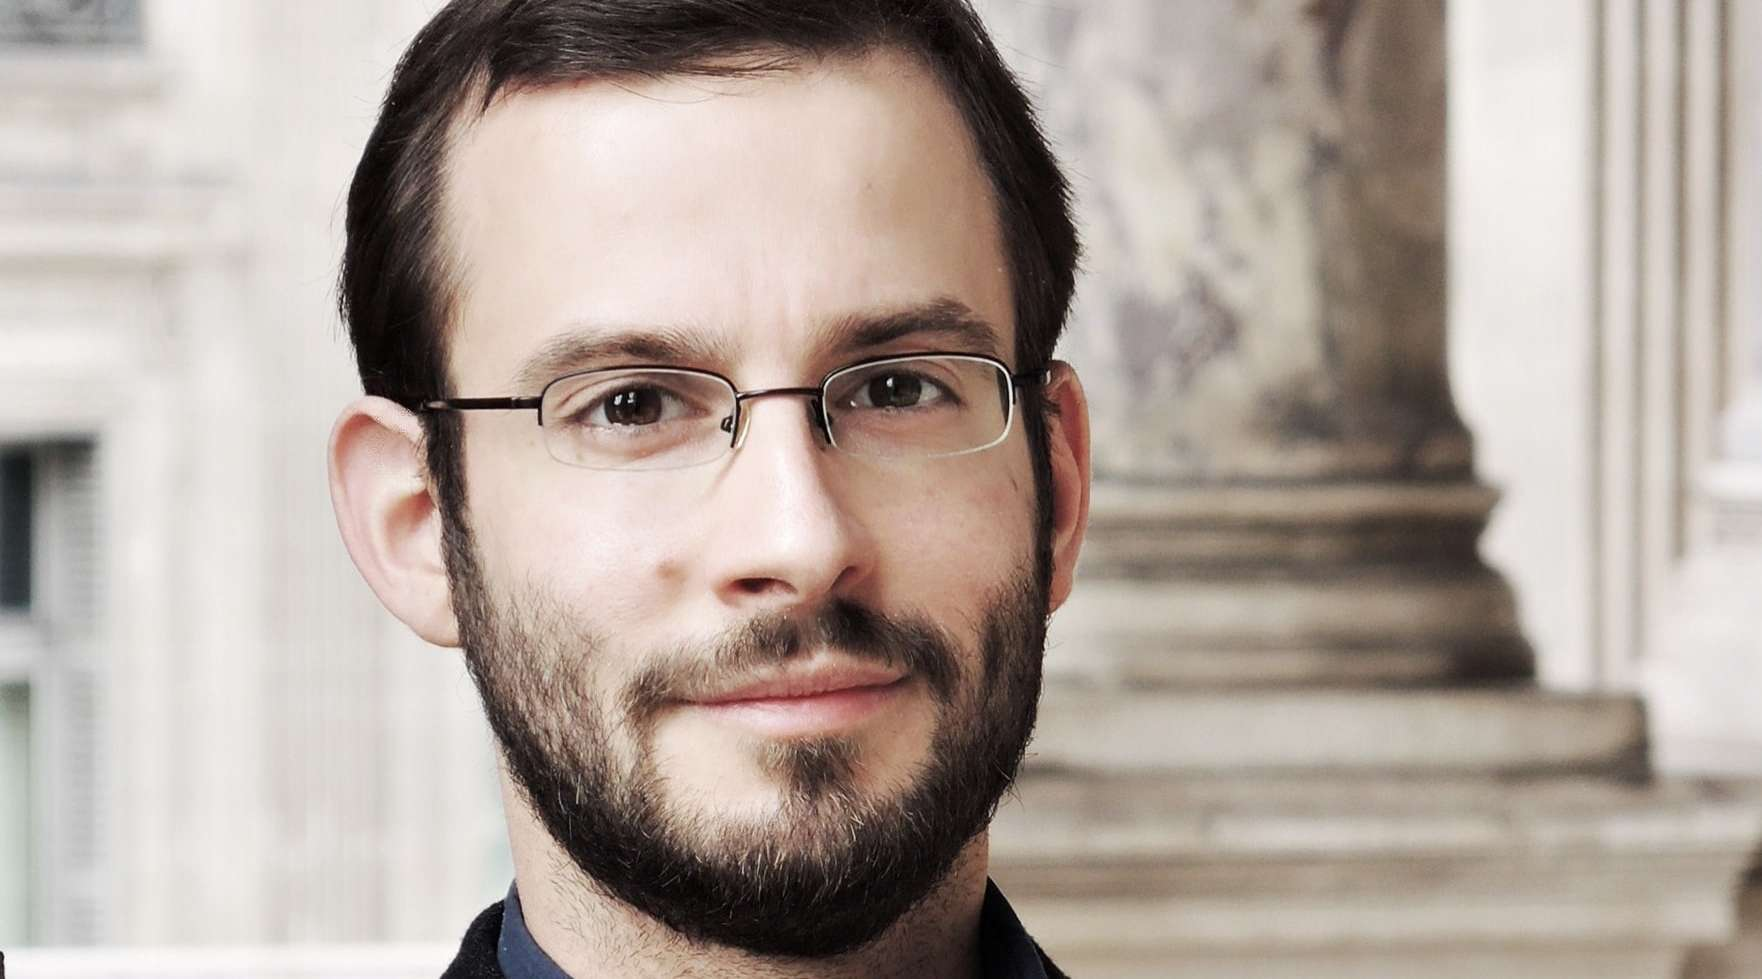 Felix Bender to conduct the season's final Gala atPhilharmonie Essen